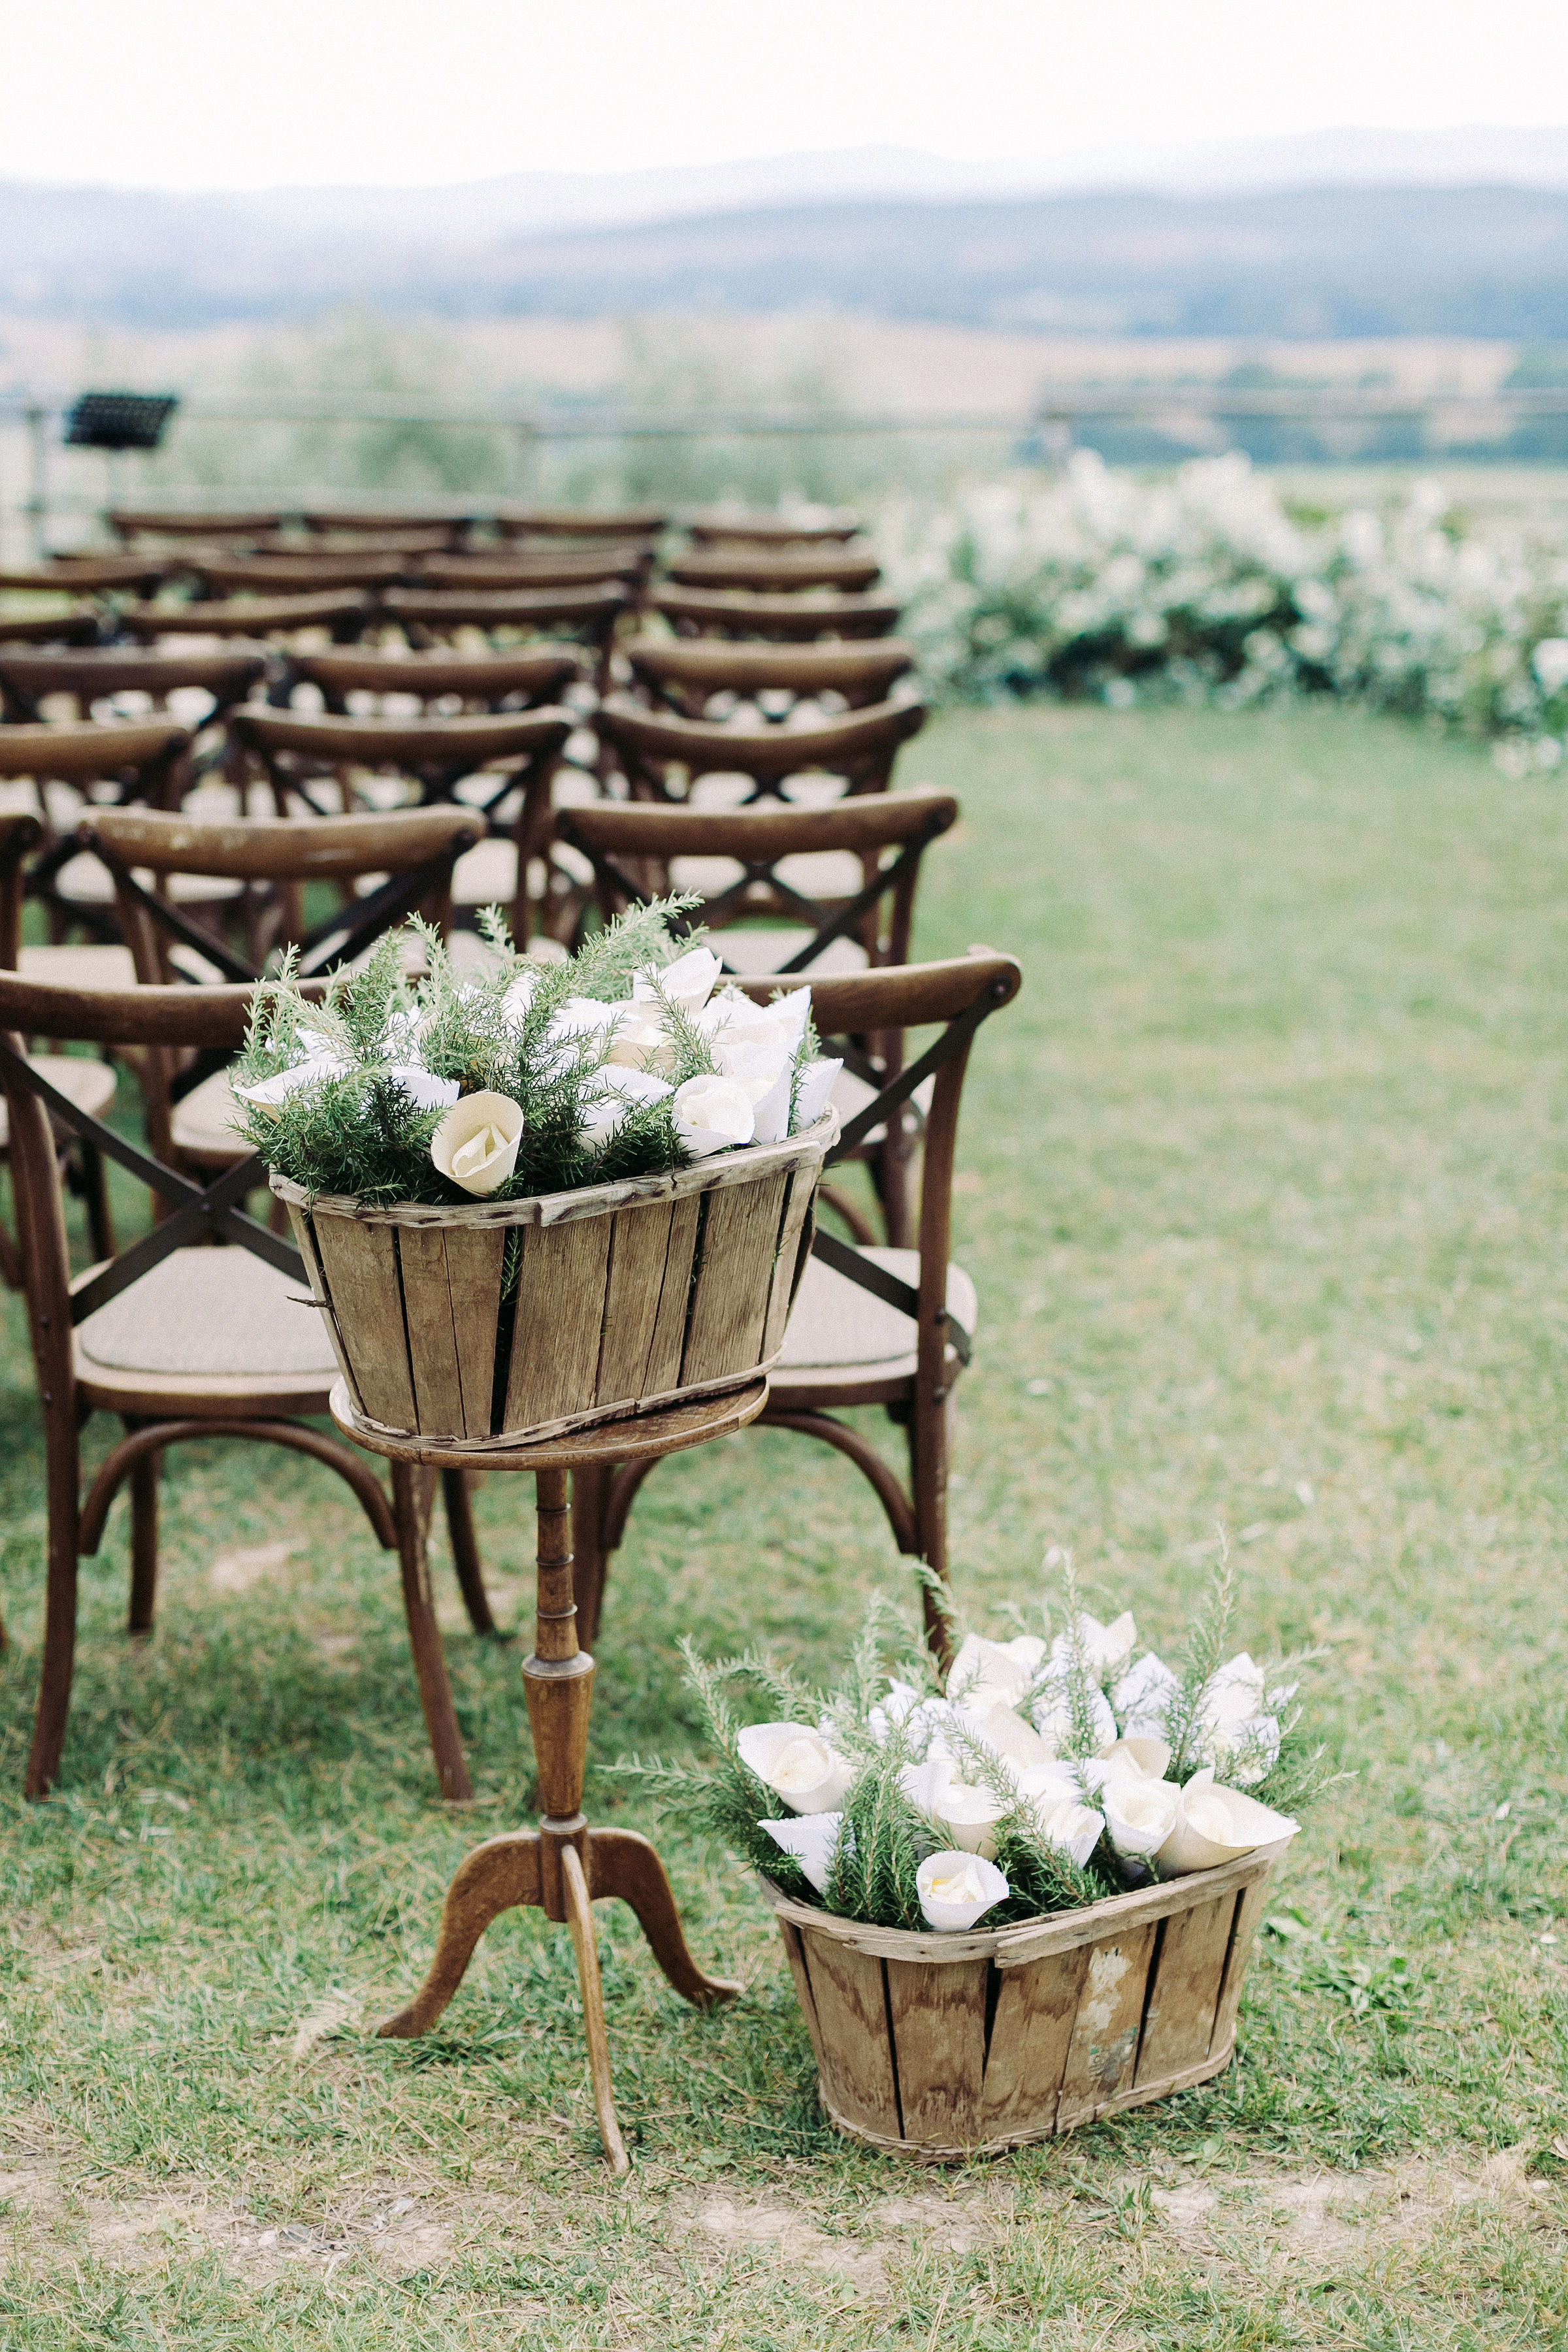 kseniya sadhir wedding seats and favors